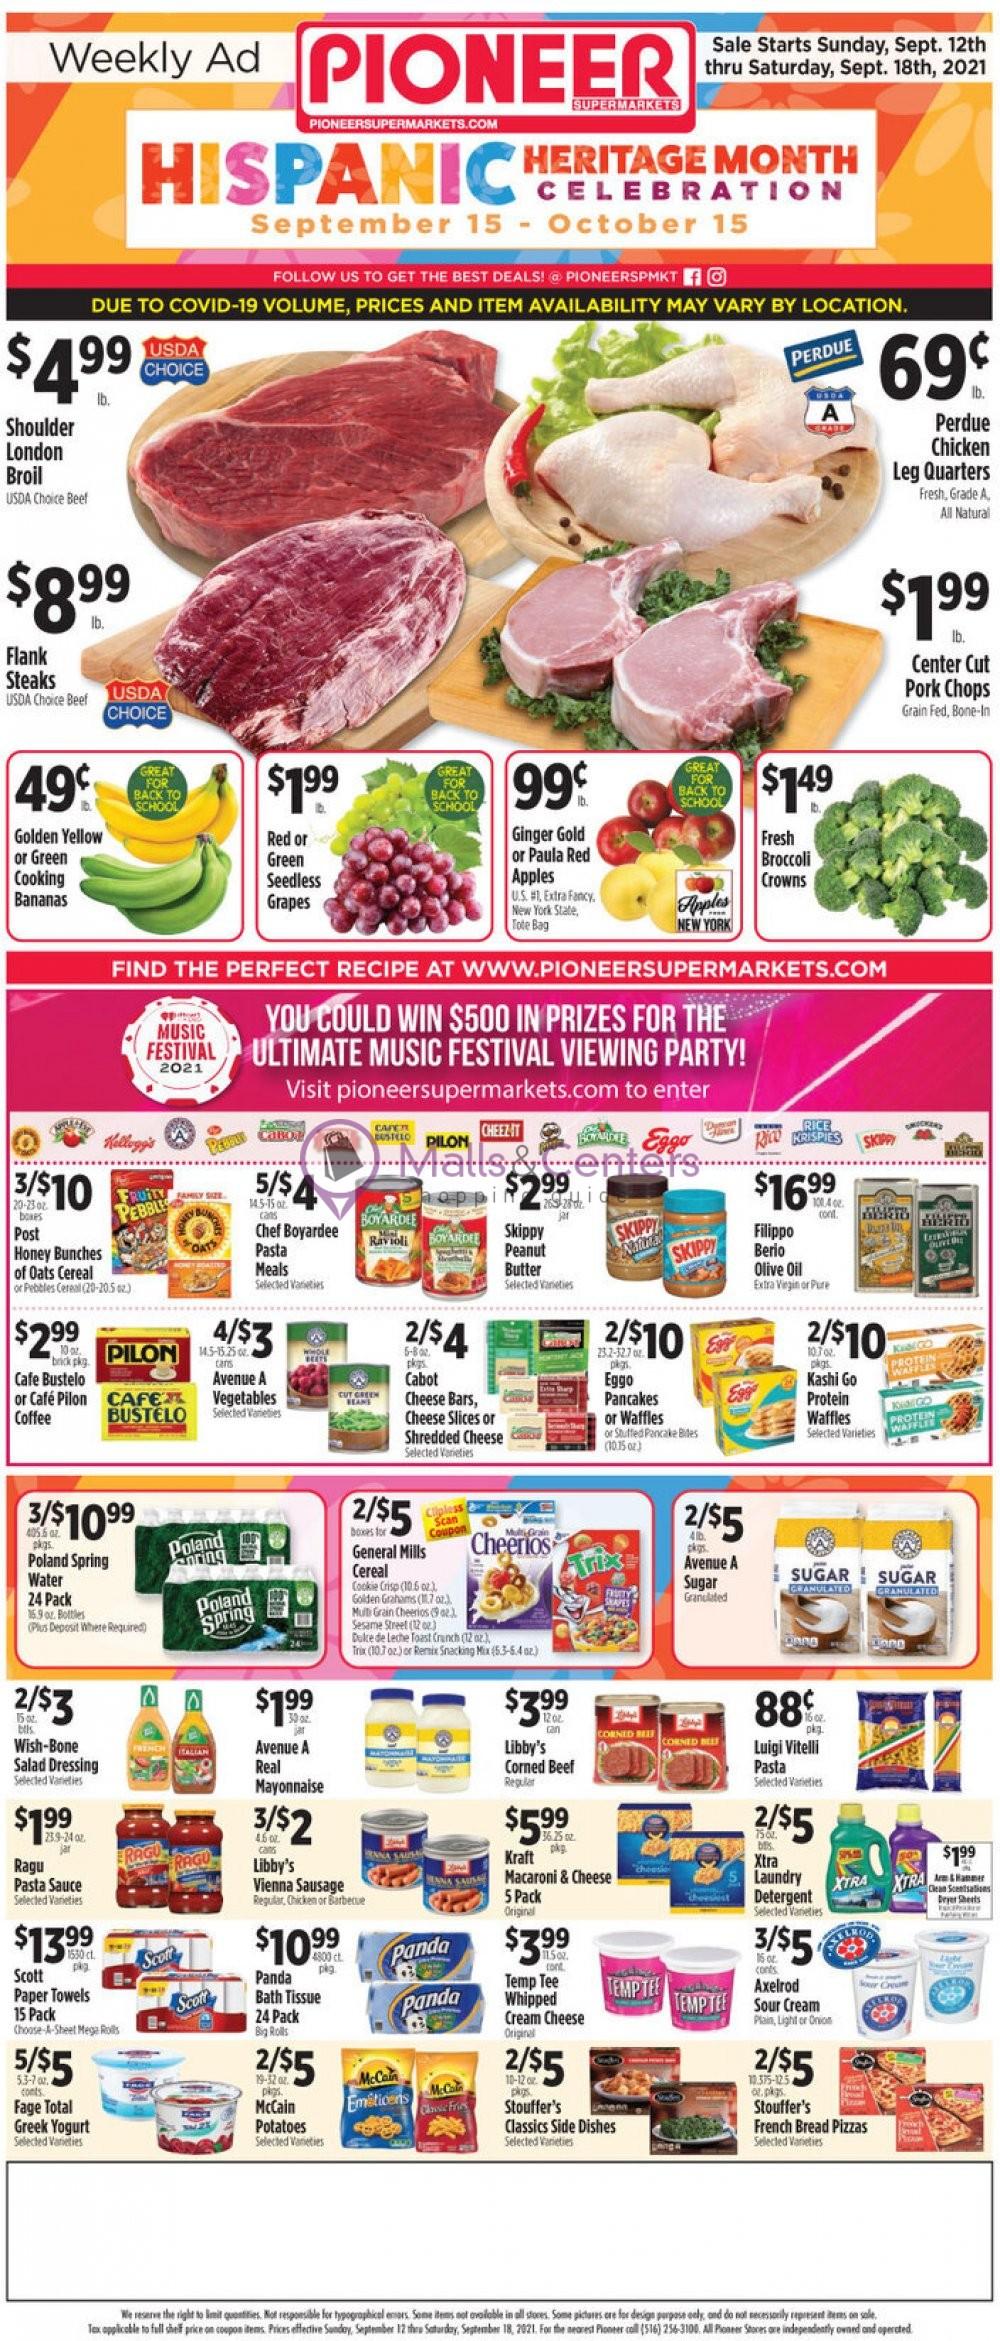 weekly ads PioneerSupermarkets - page 1 - mallscenters.com